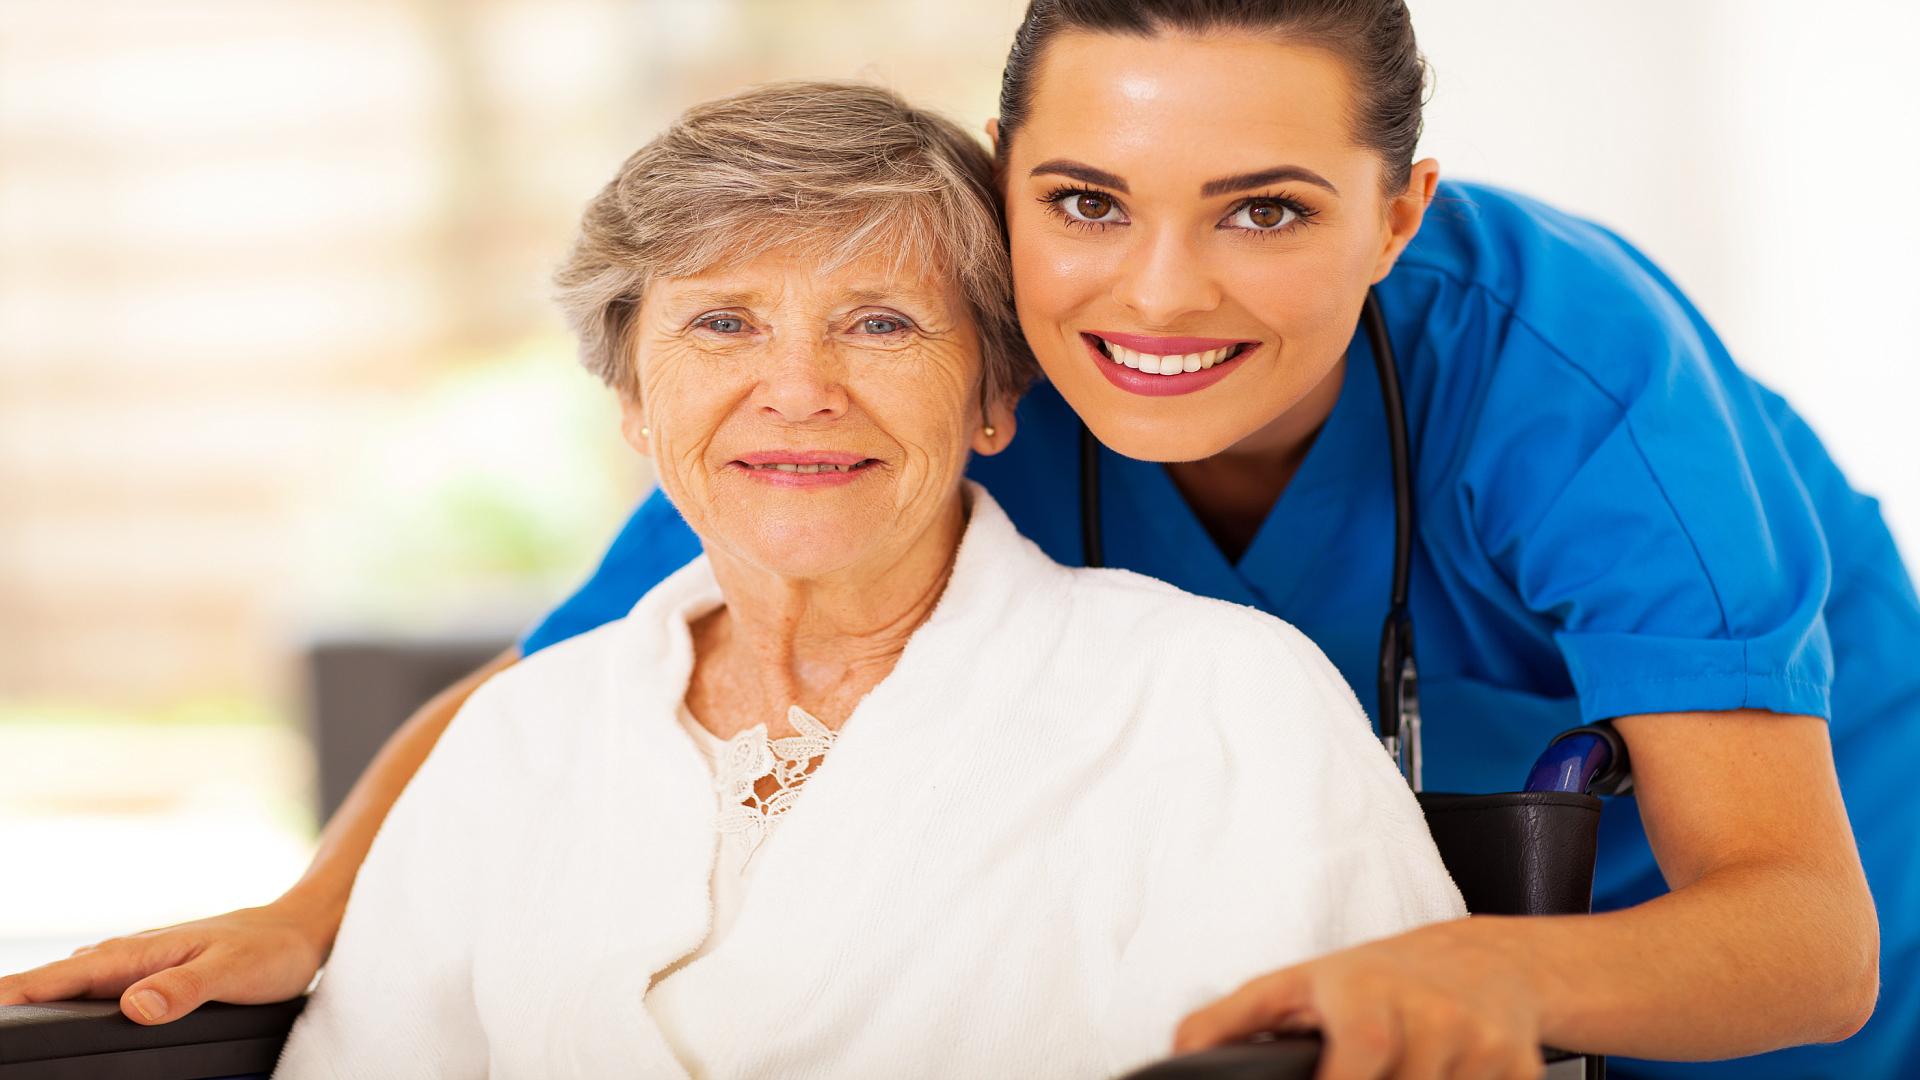 elderly care giver